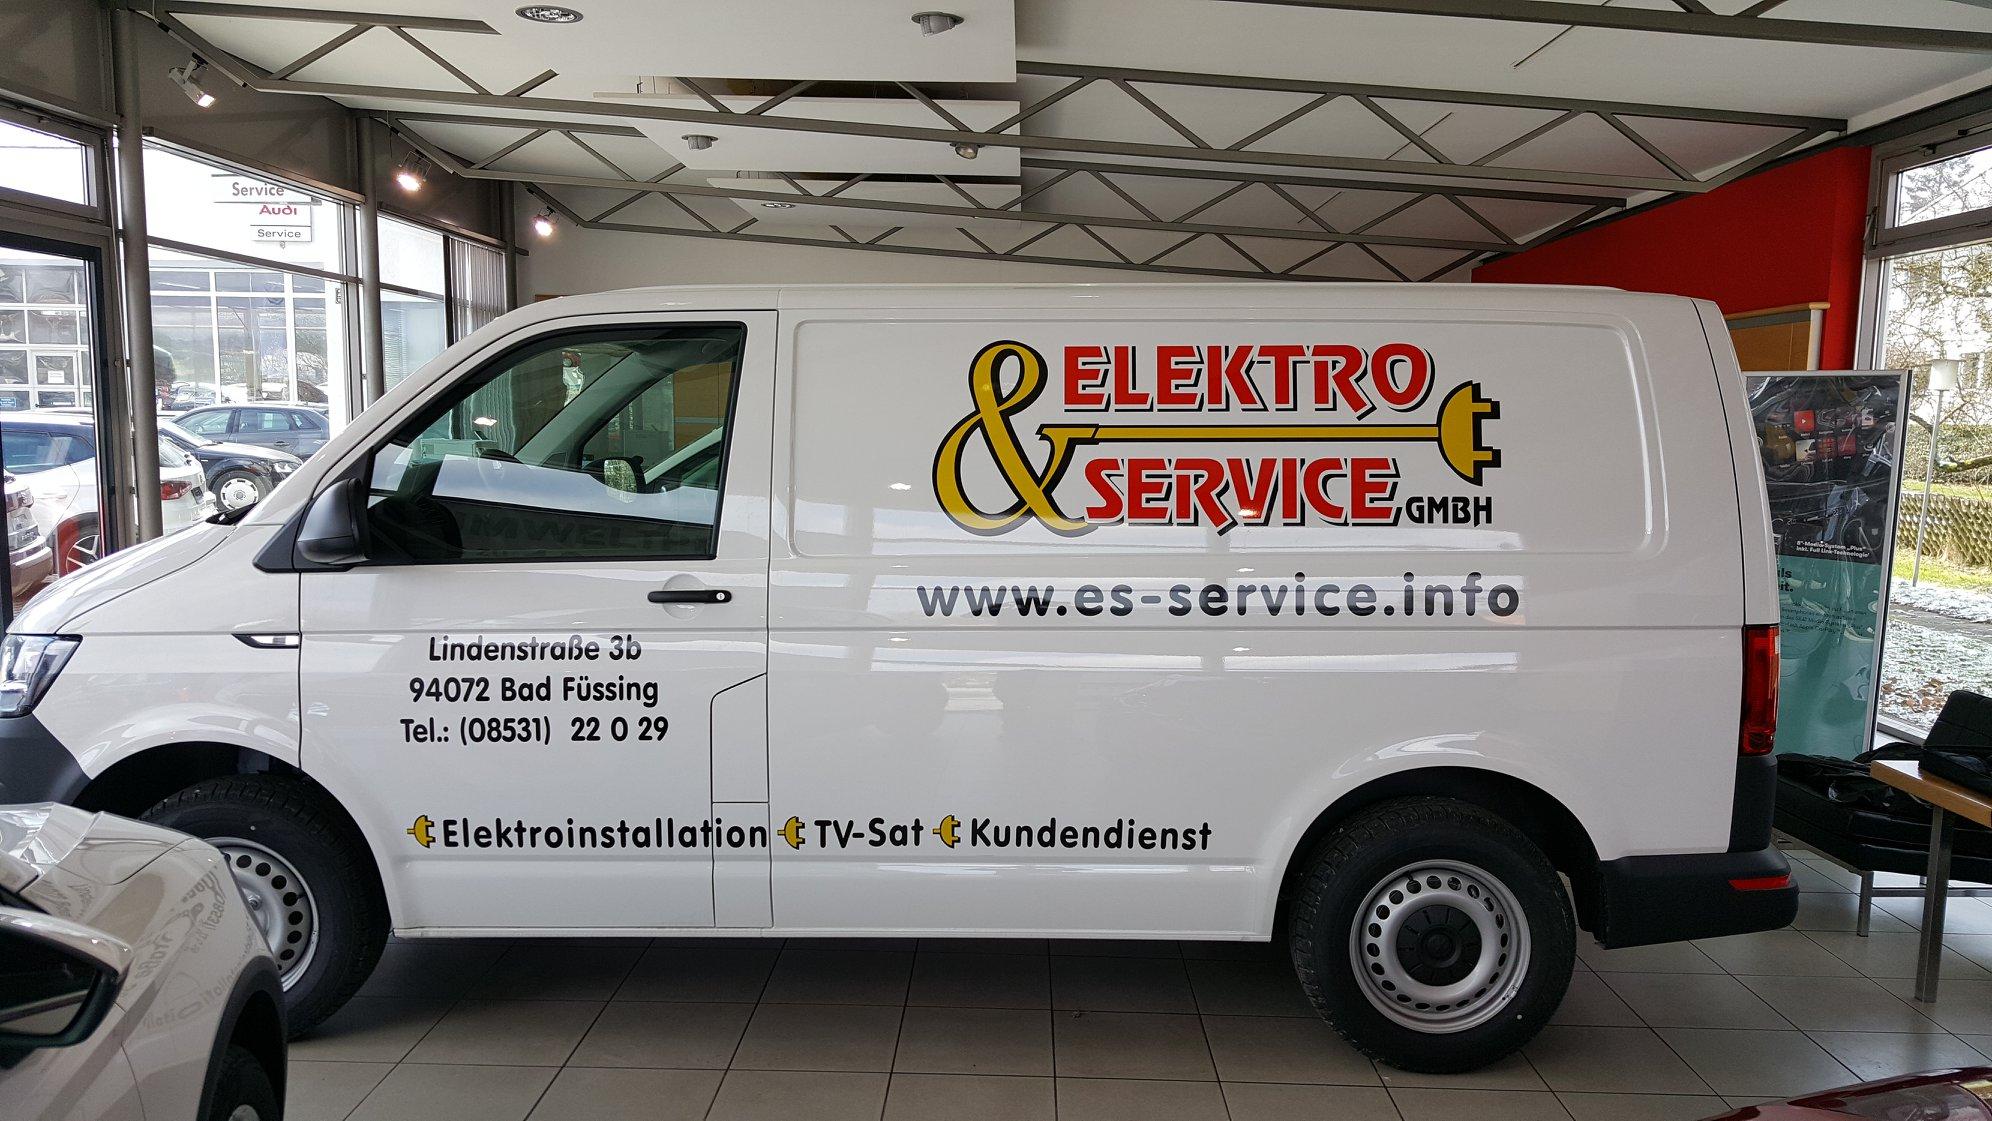 Autobeschriftung Elektro